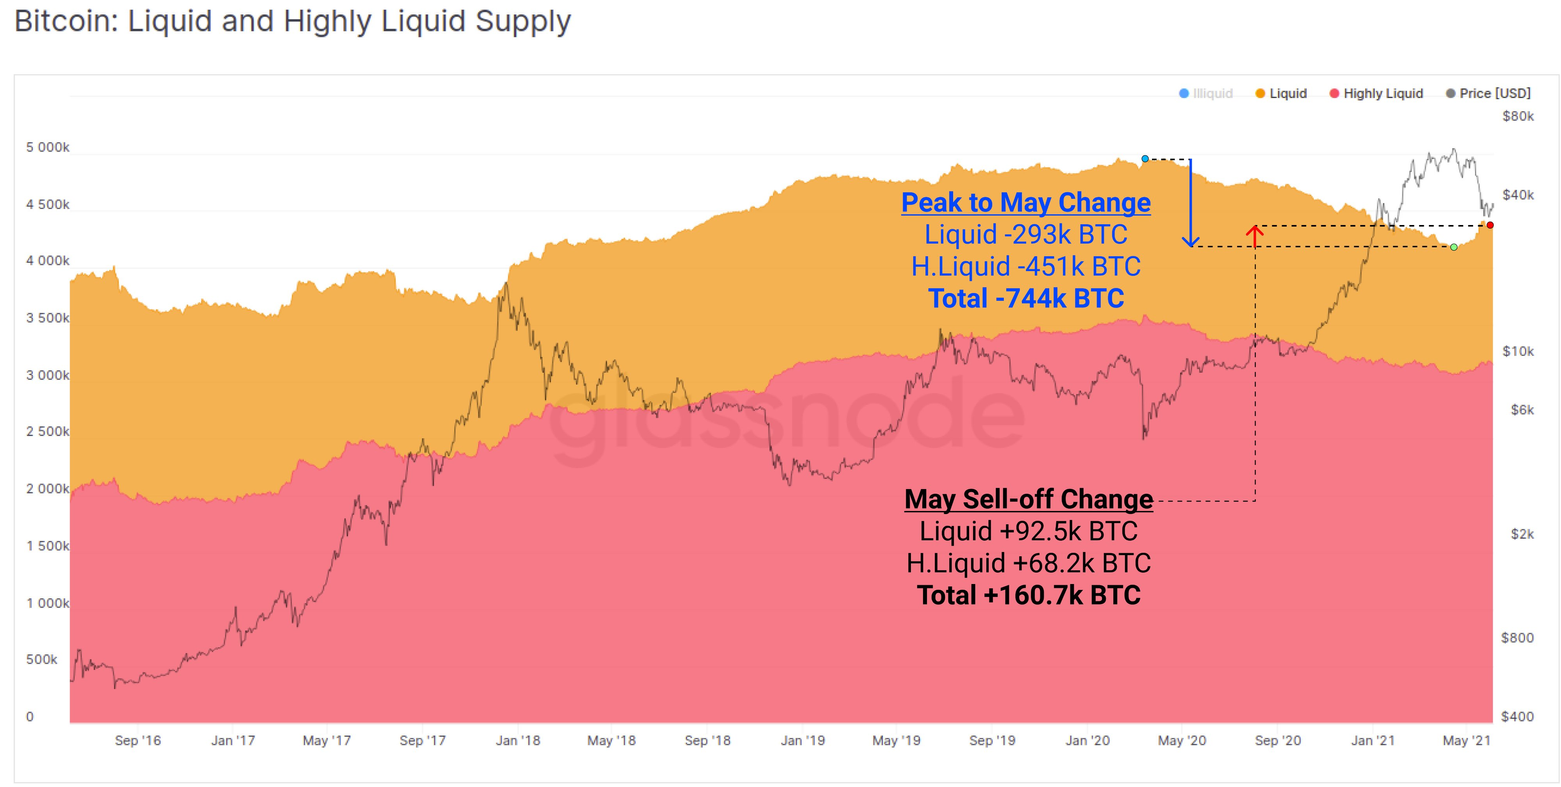 Fornecimento de Bitcoin líquido e altamente líquido.